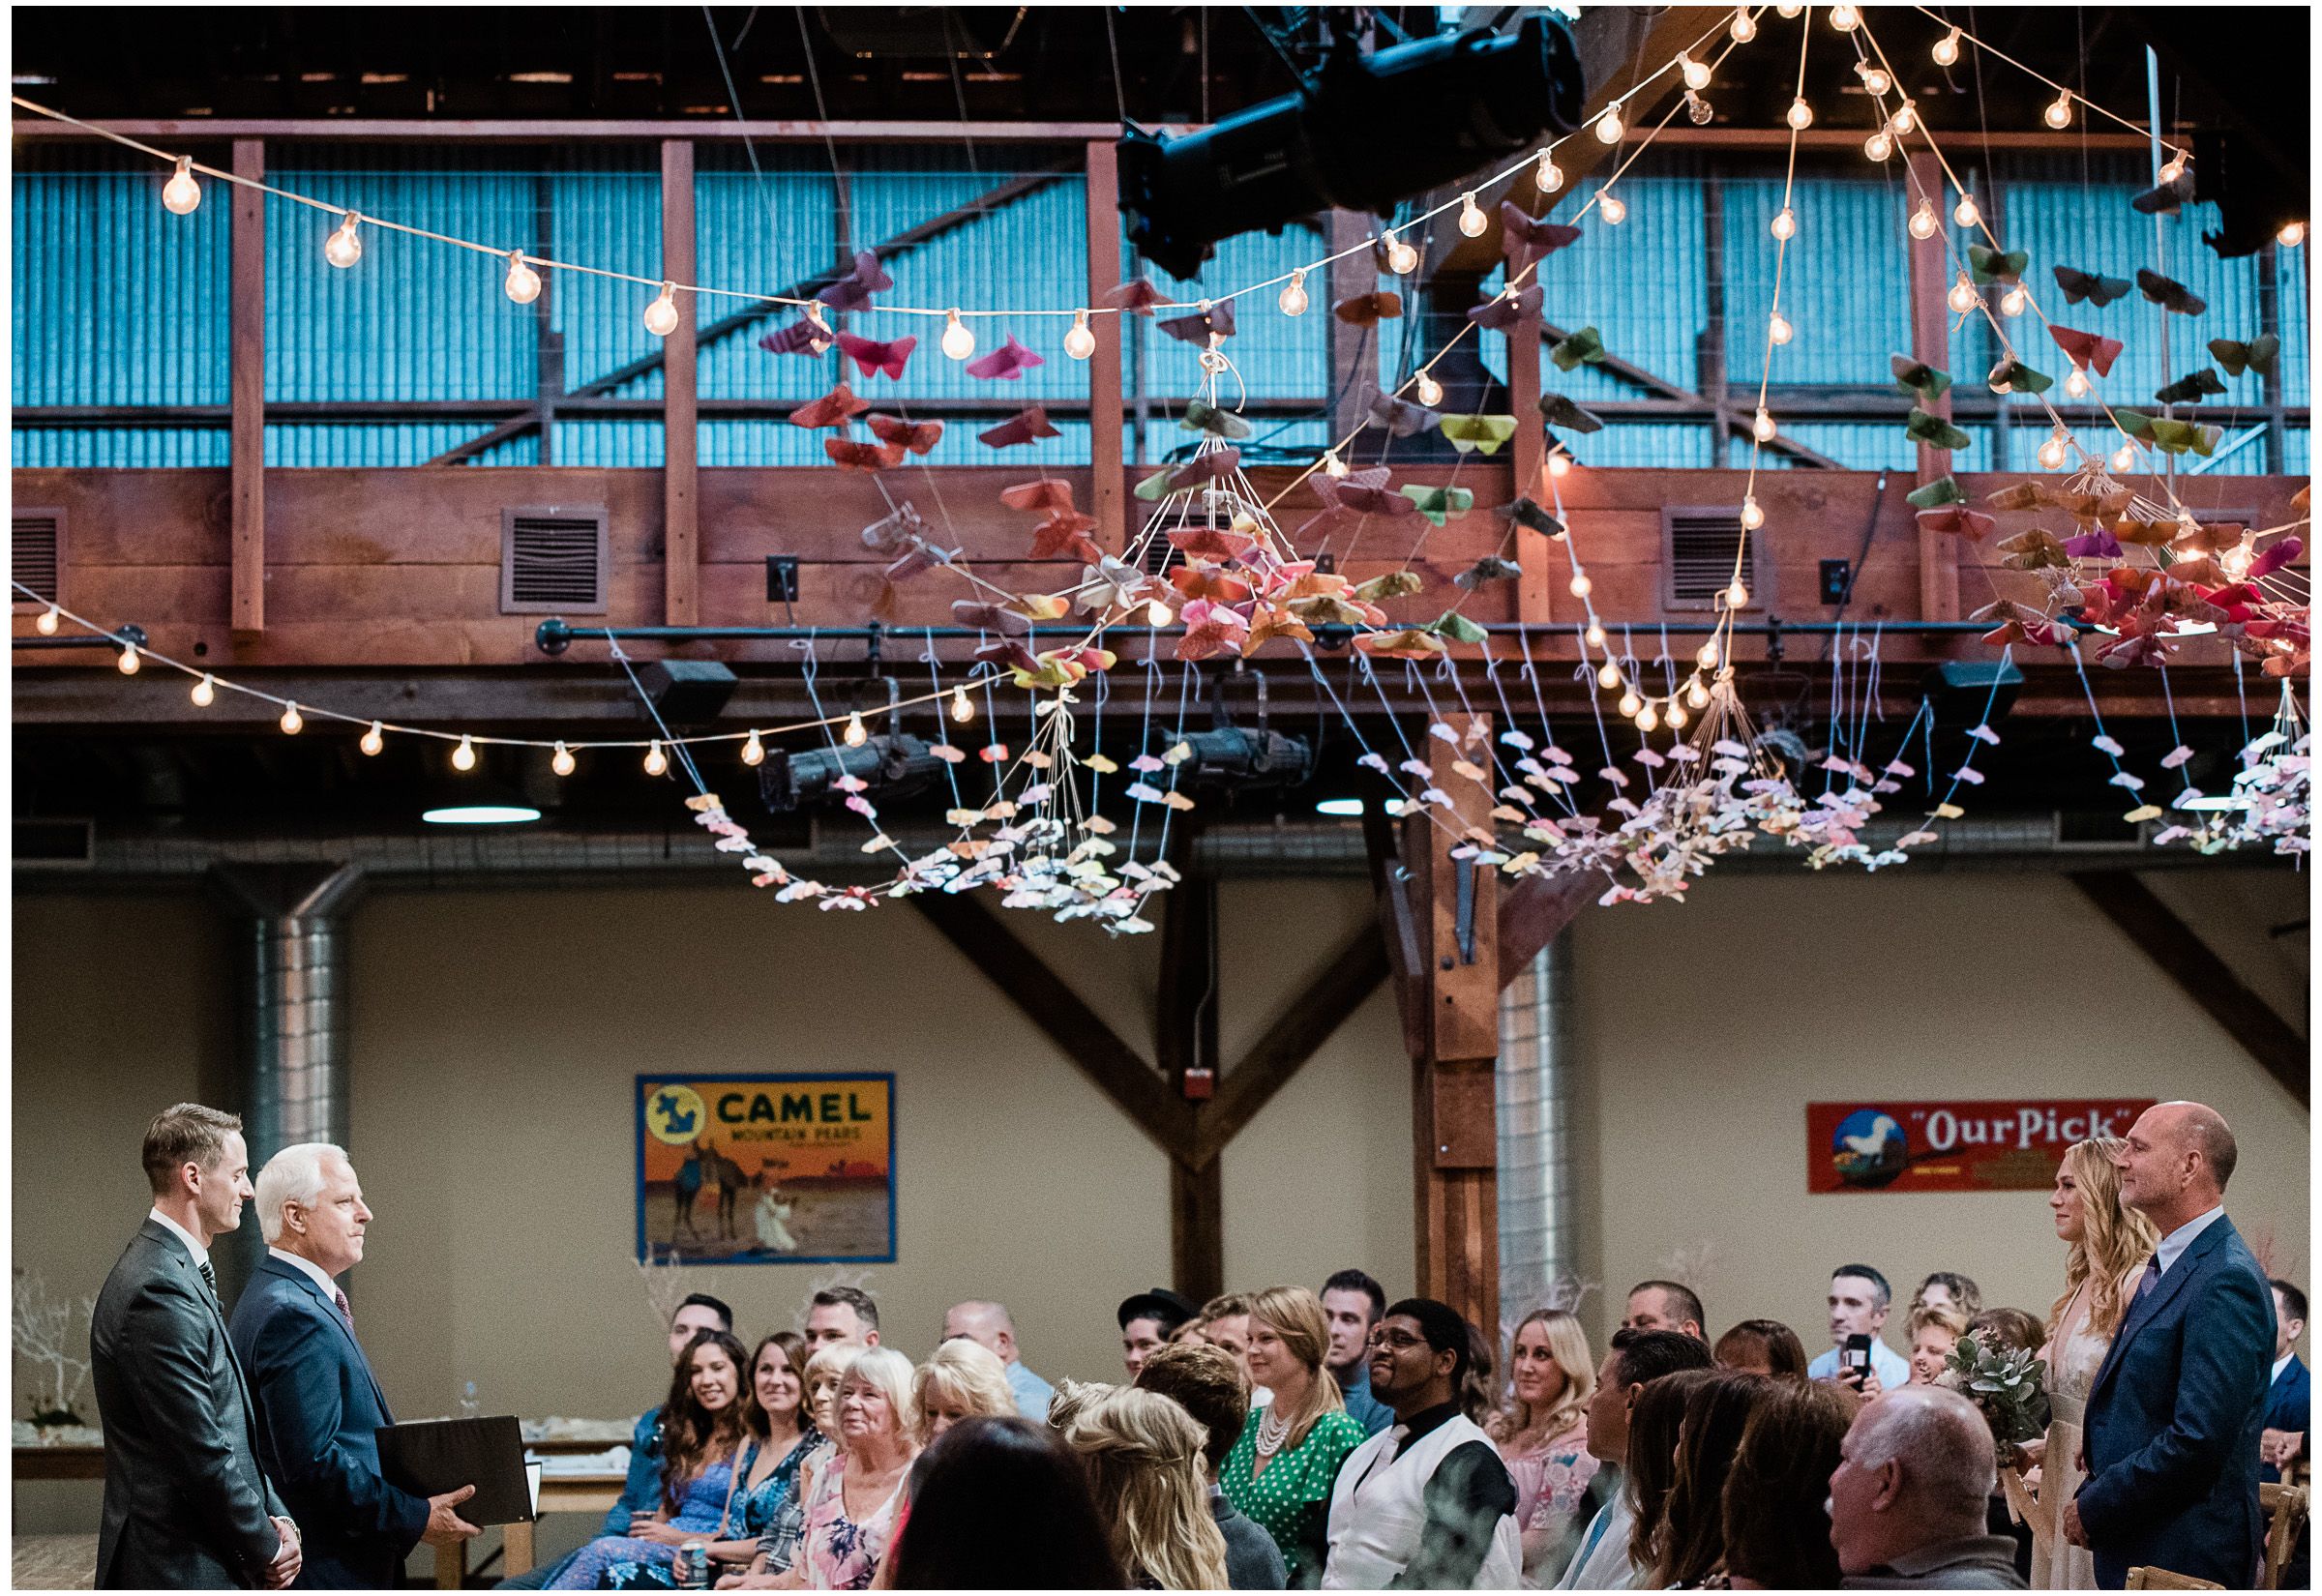 Loomis Wedding - Sacramento Photographer - Blue Goose - Justin Wilcox Photography - 11.jpg